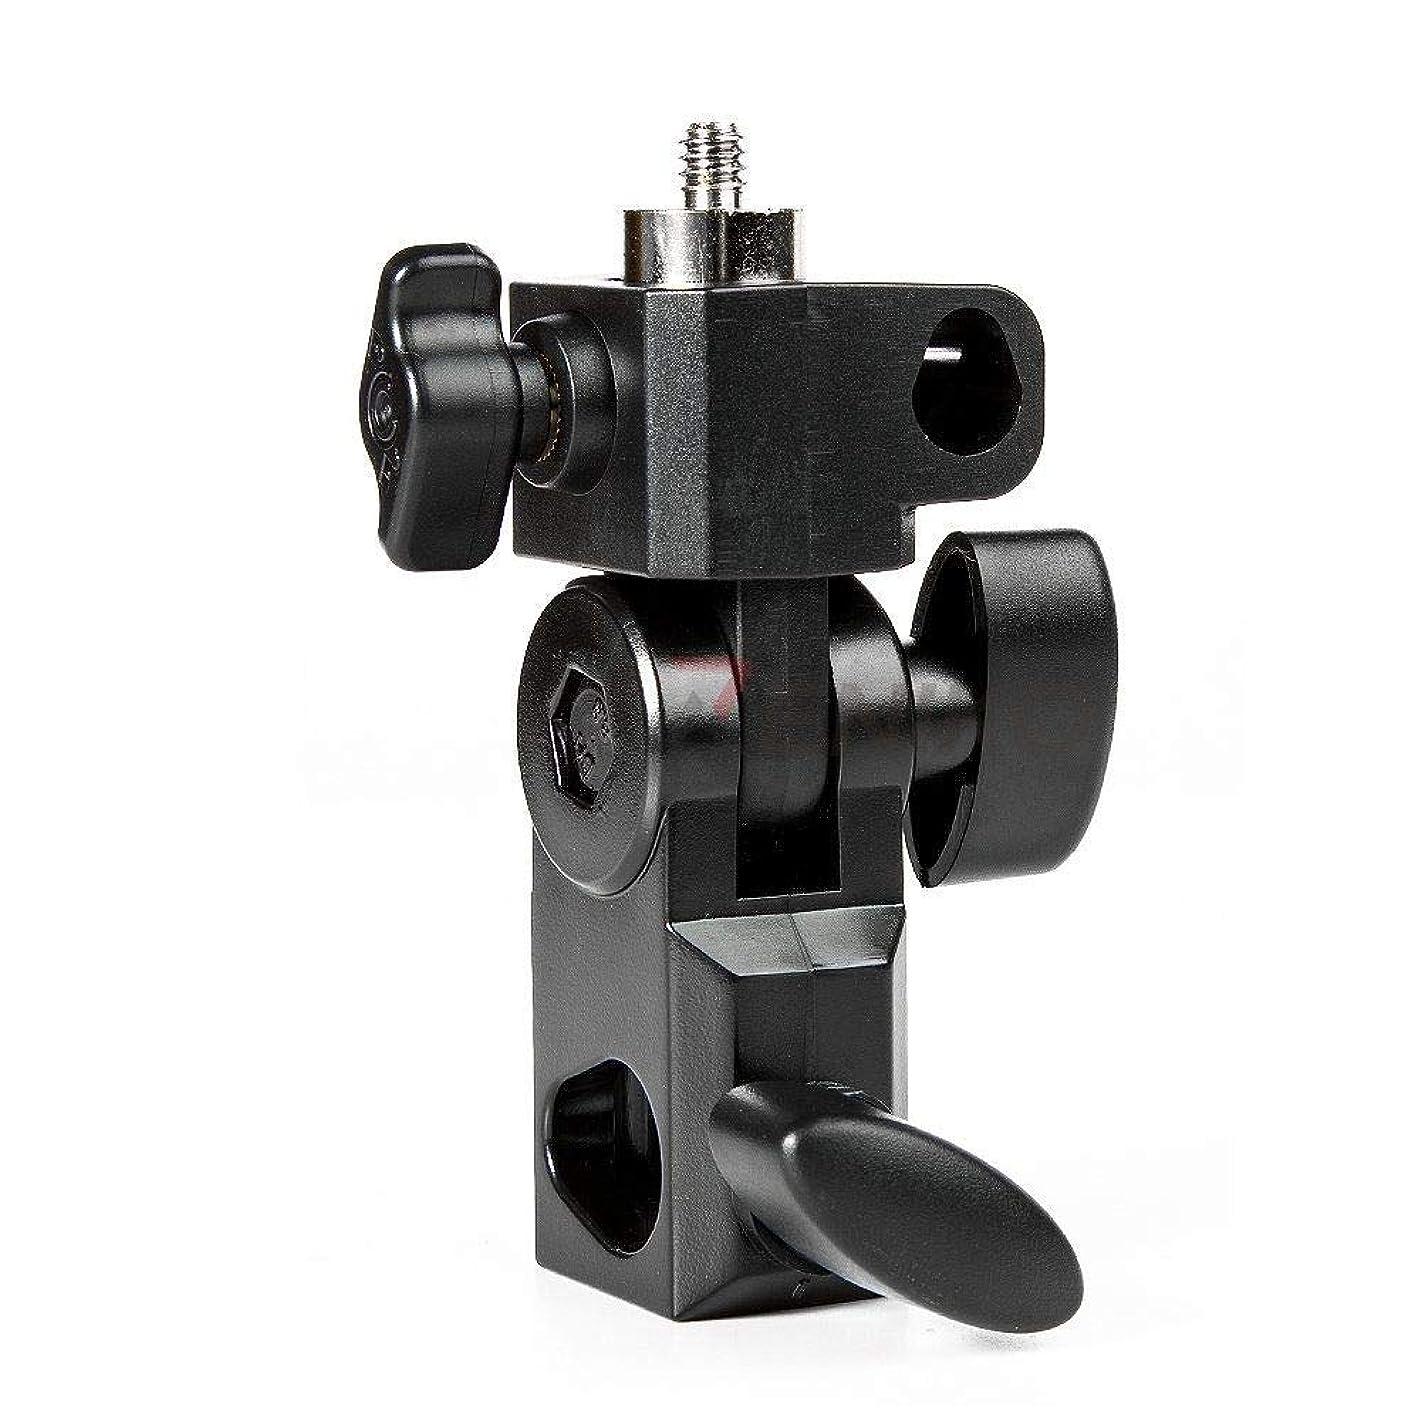 FidgetFidget Light Stand Holder Bracket for Godox AD200 Camera Flash SpeedliteAD-E 1/4